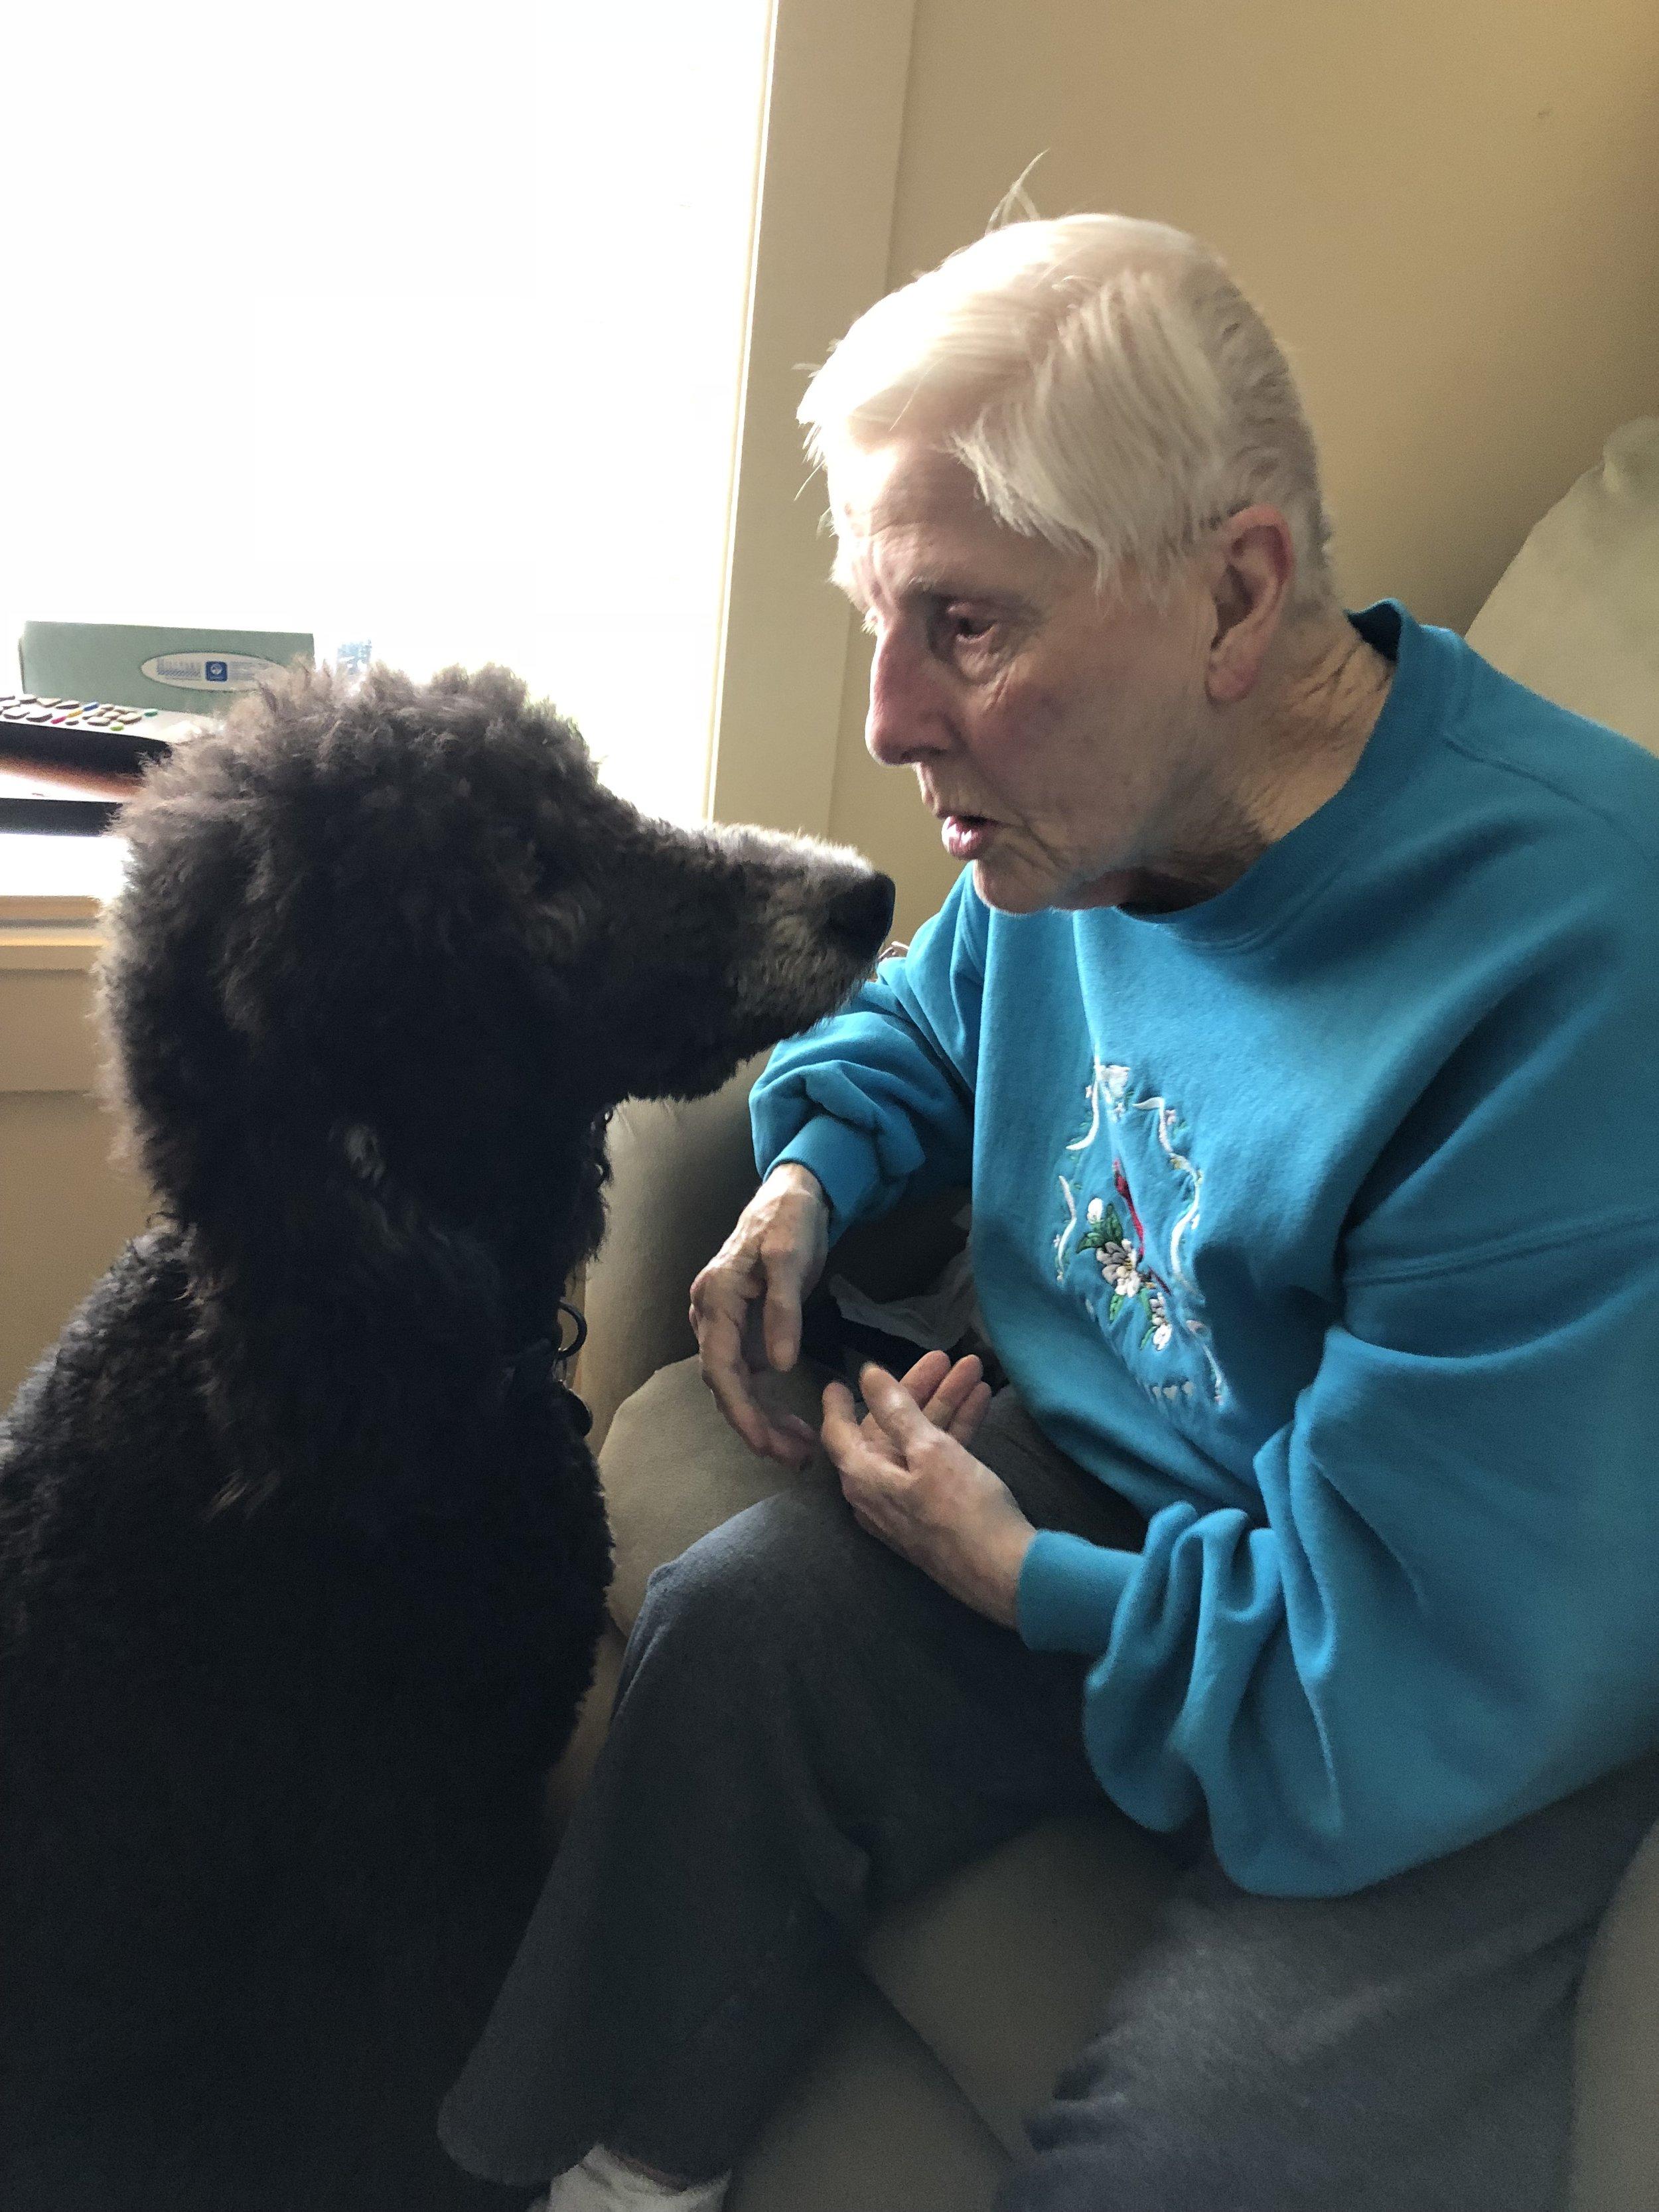 Otis (Siri x Drakkar) is a therapy dog.